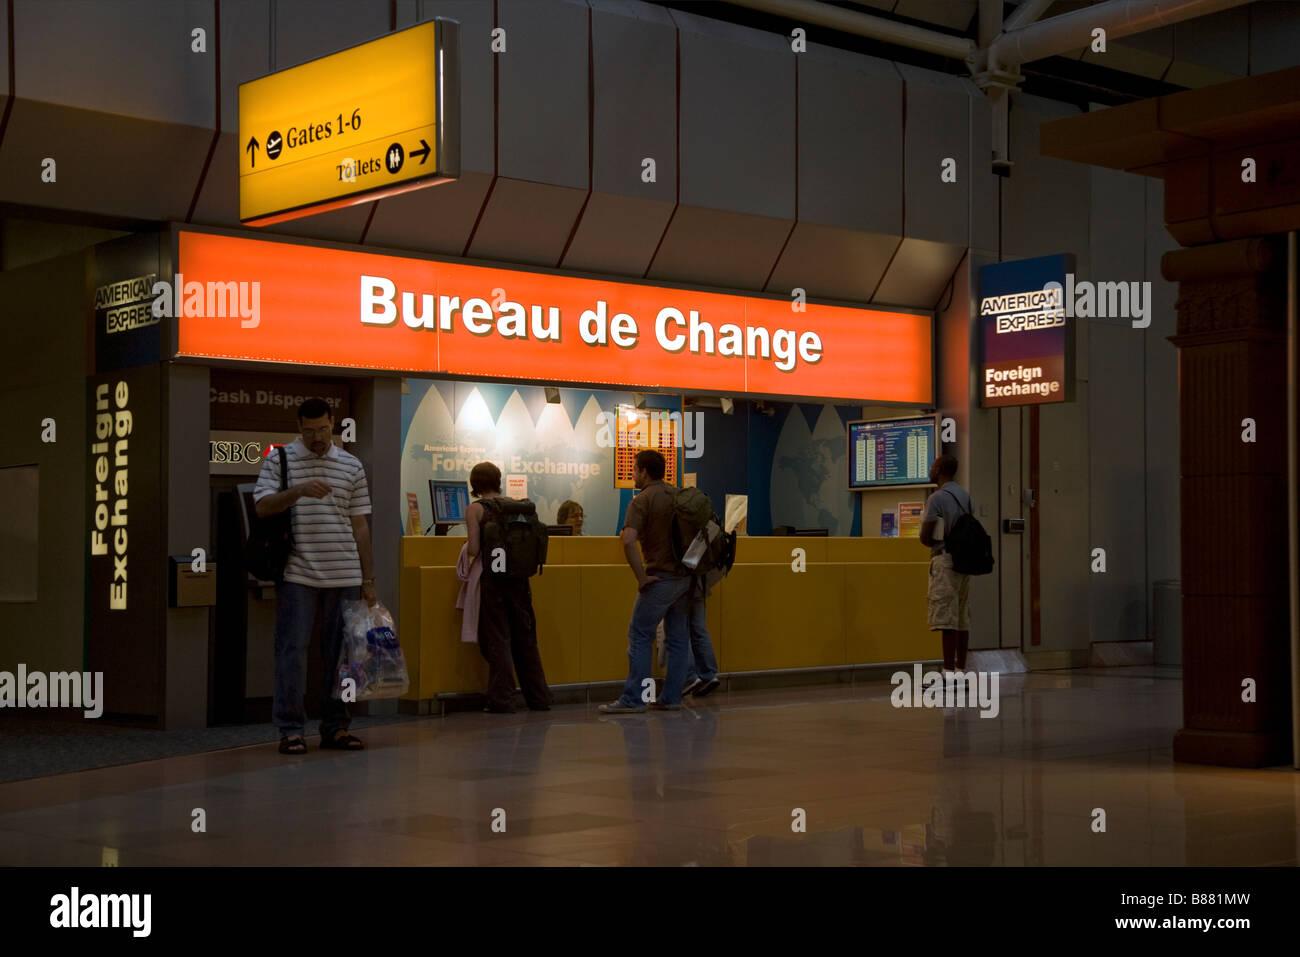 Bureau de change office betrieben von american express am london